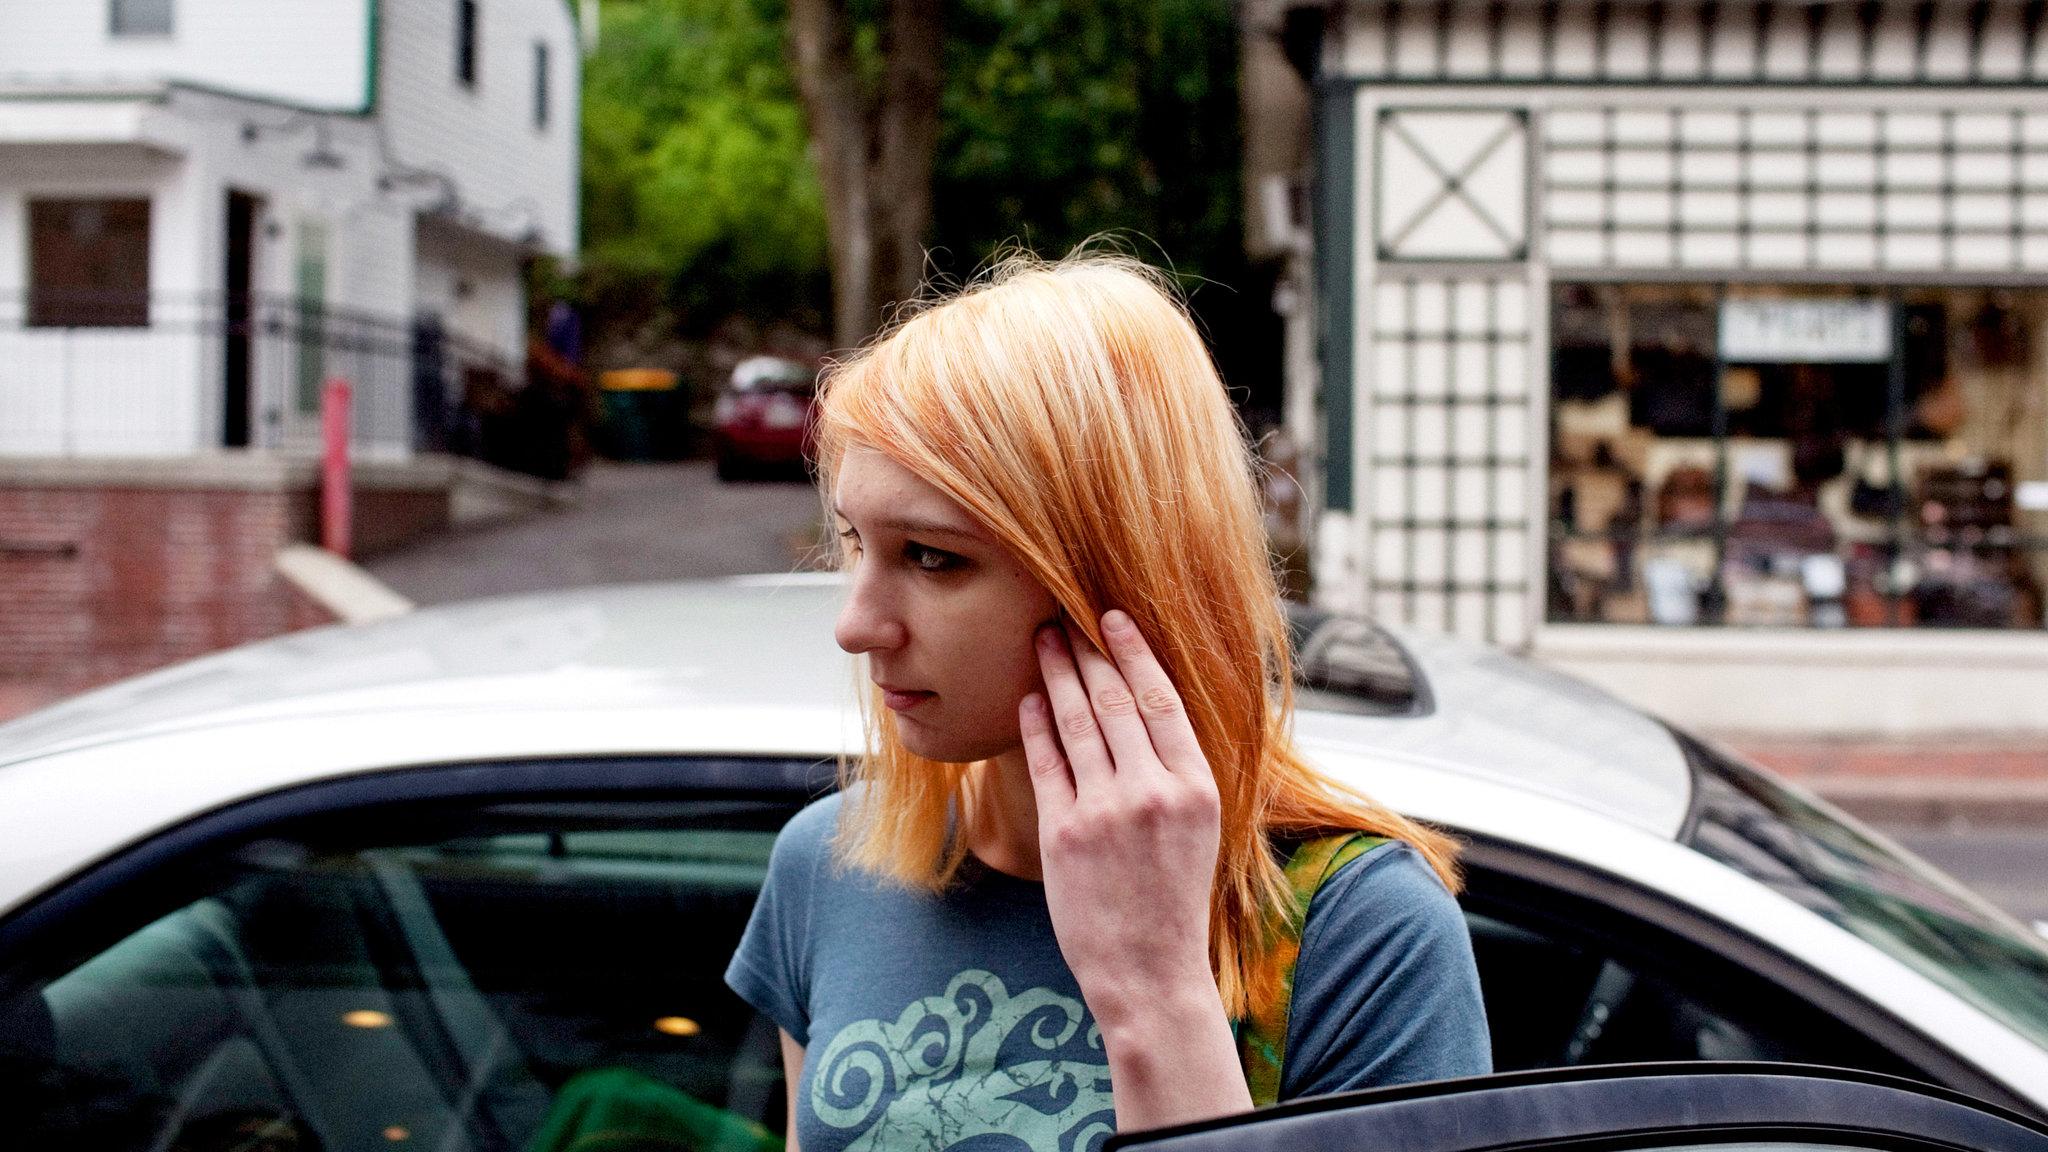 Sweden college girl mobile shoot sex mobile